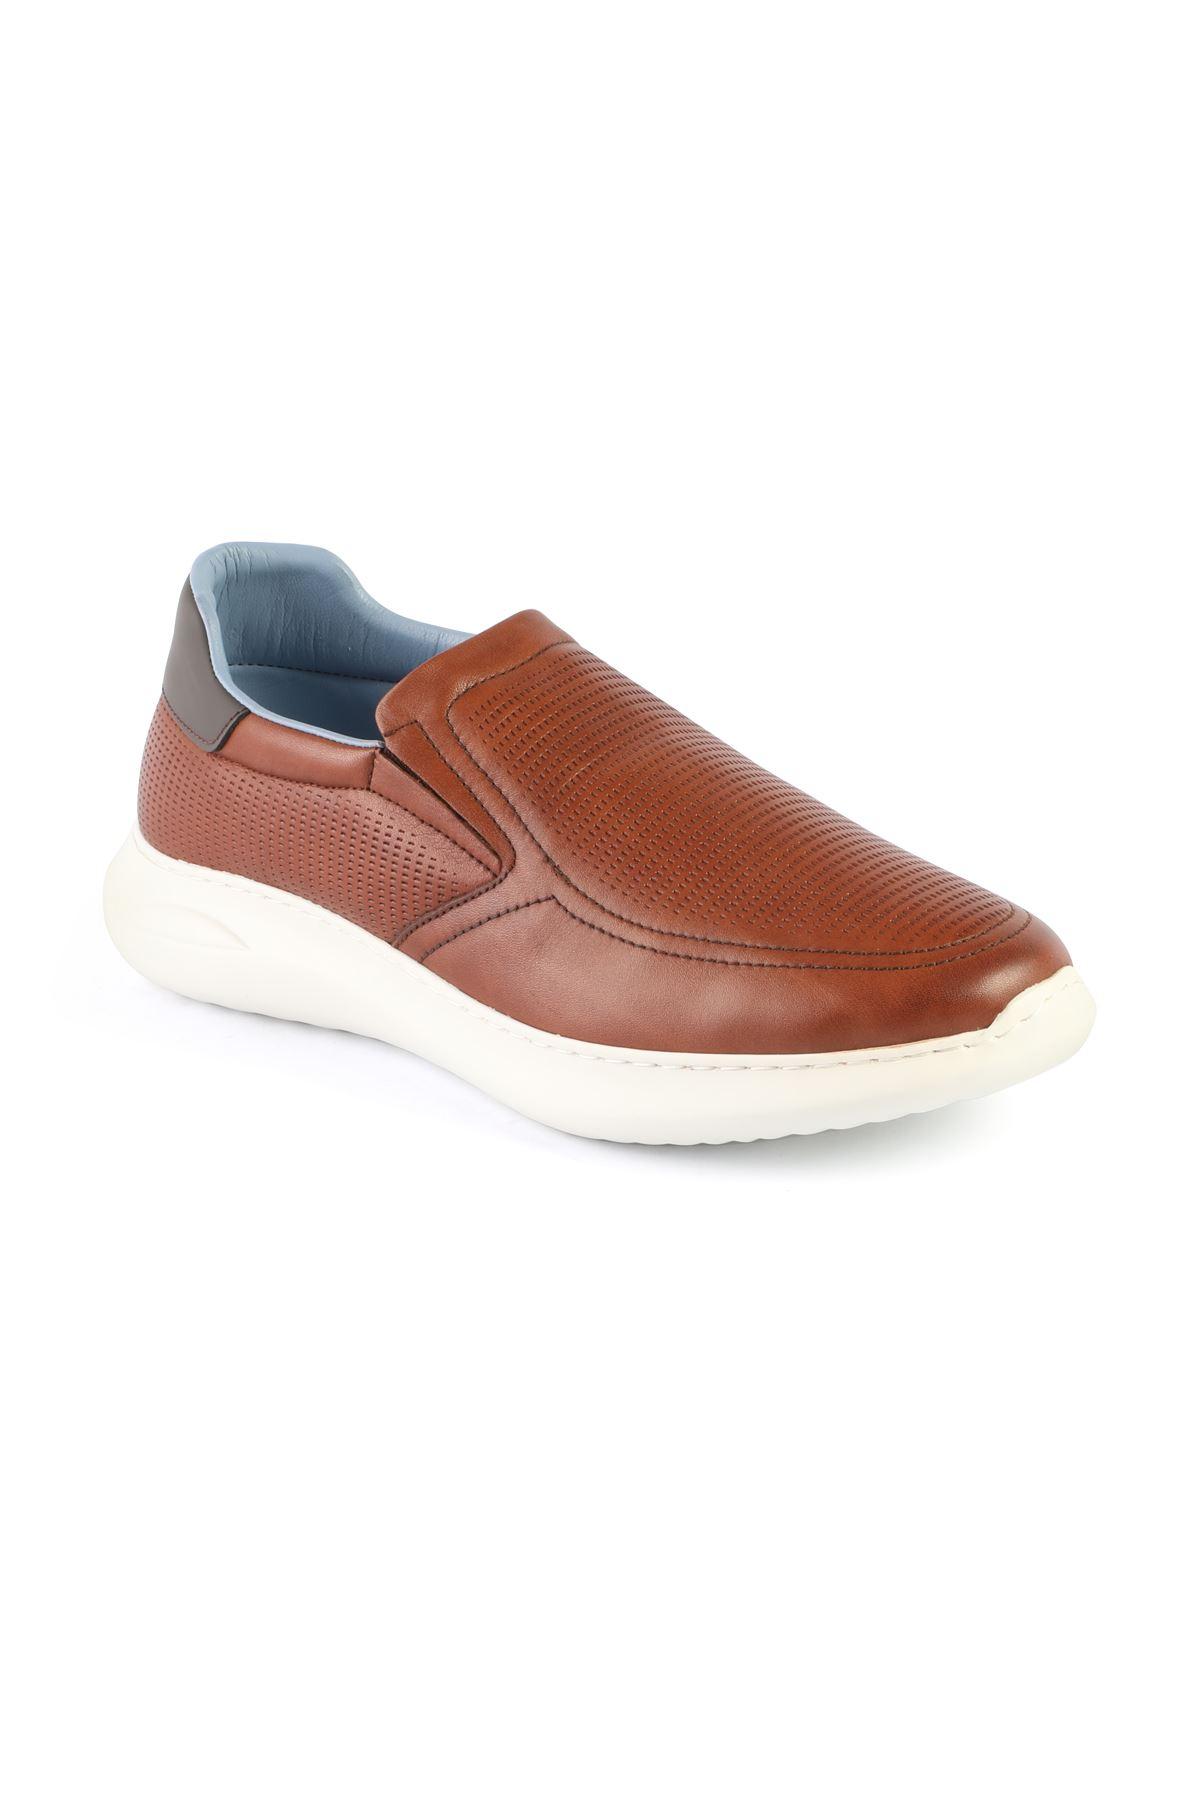 Libero L3413 Tan Sports Shoes